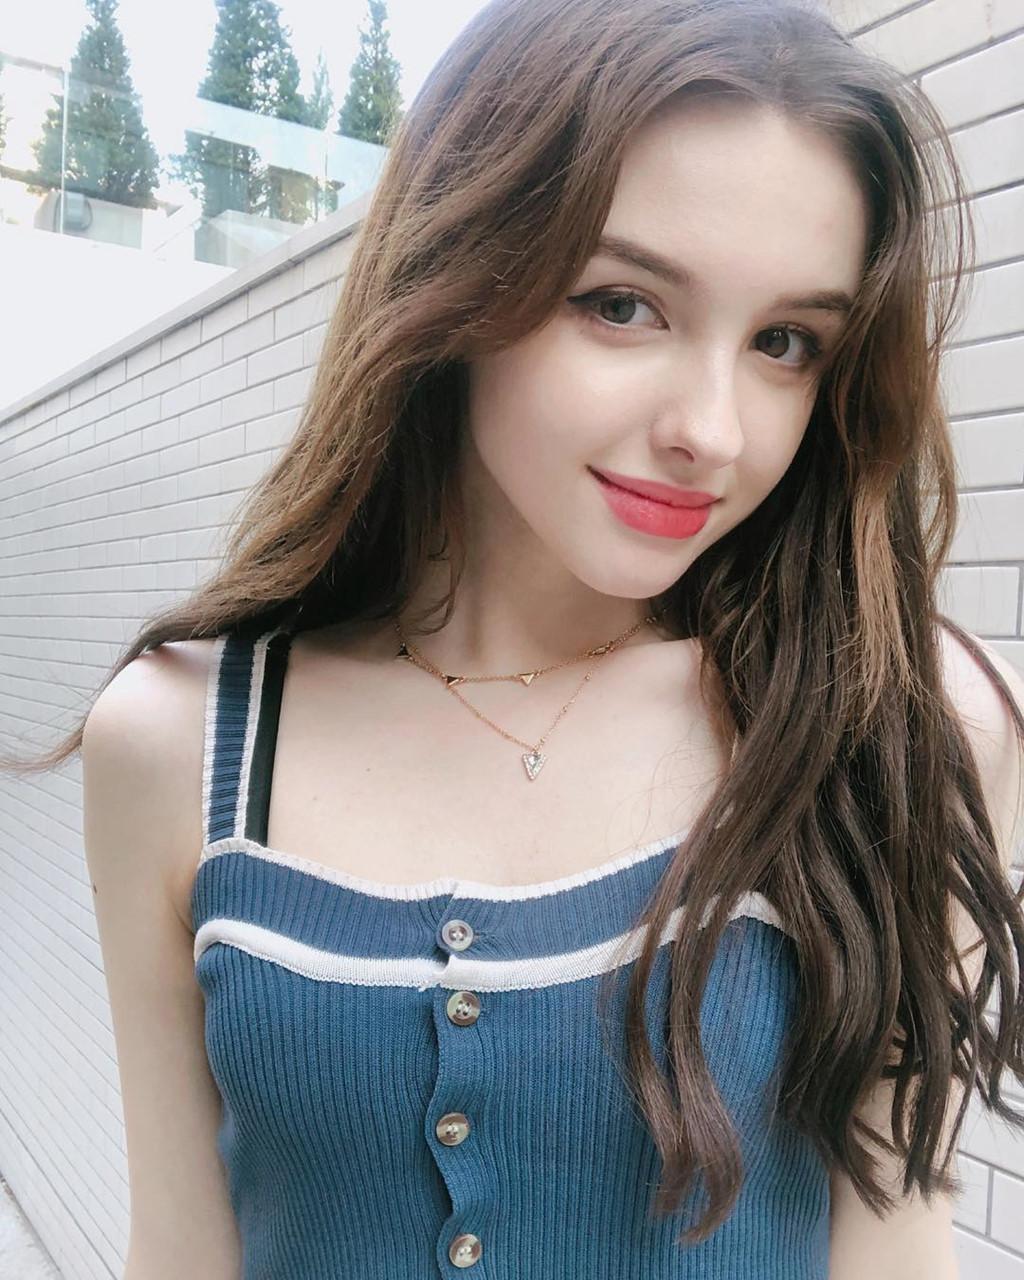 hot-girl-Karimova-Elina-dao-tung-chao-gioi-tre-vi-qua-xinh-dep (5)